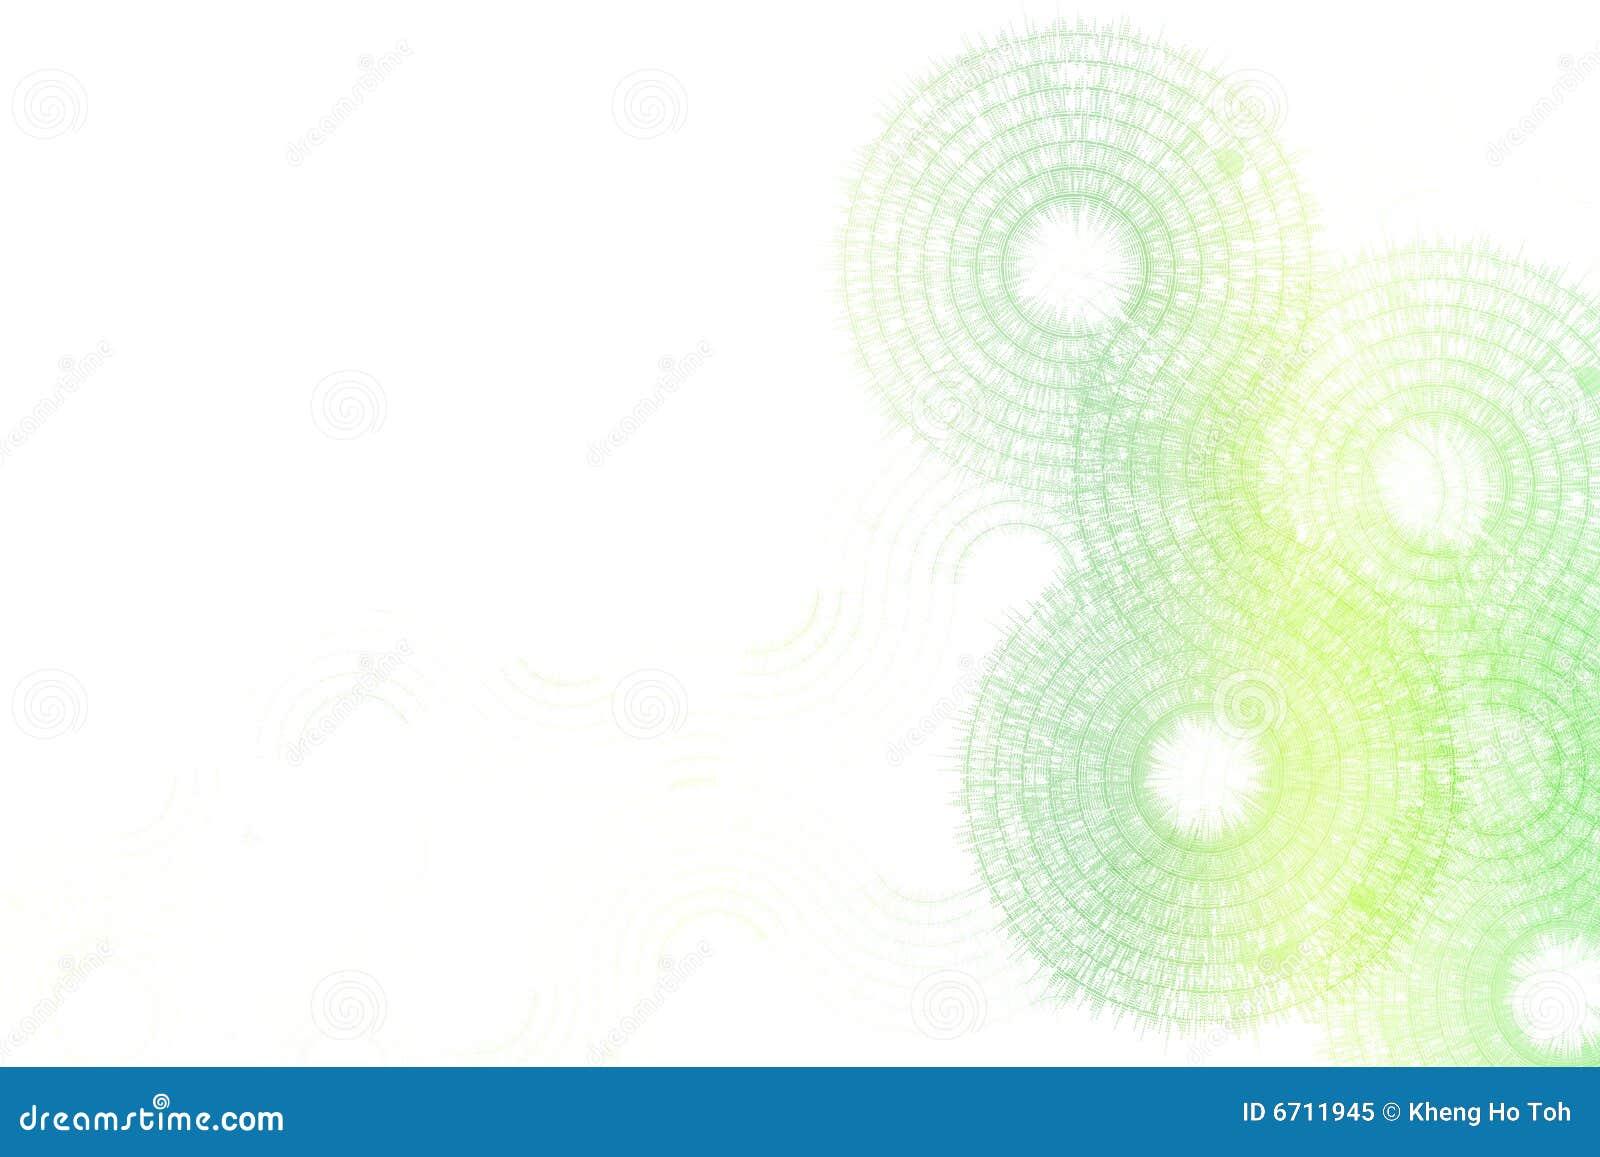 Green White Fractal Abstract Design Stock Illustration